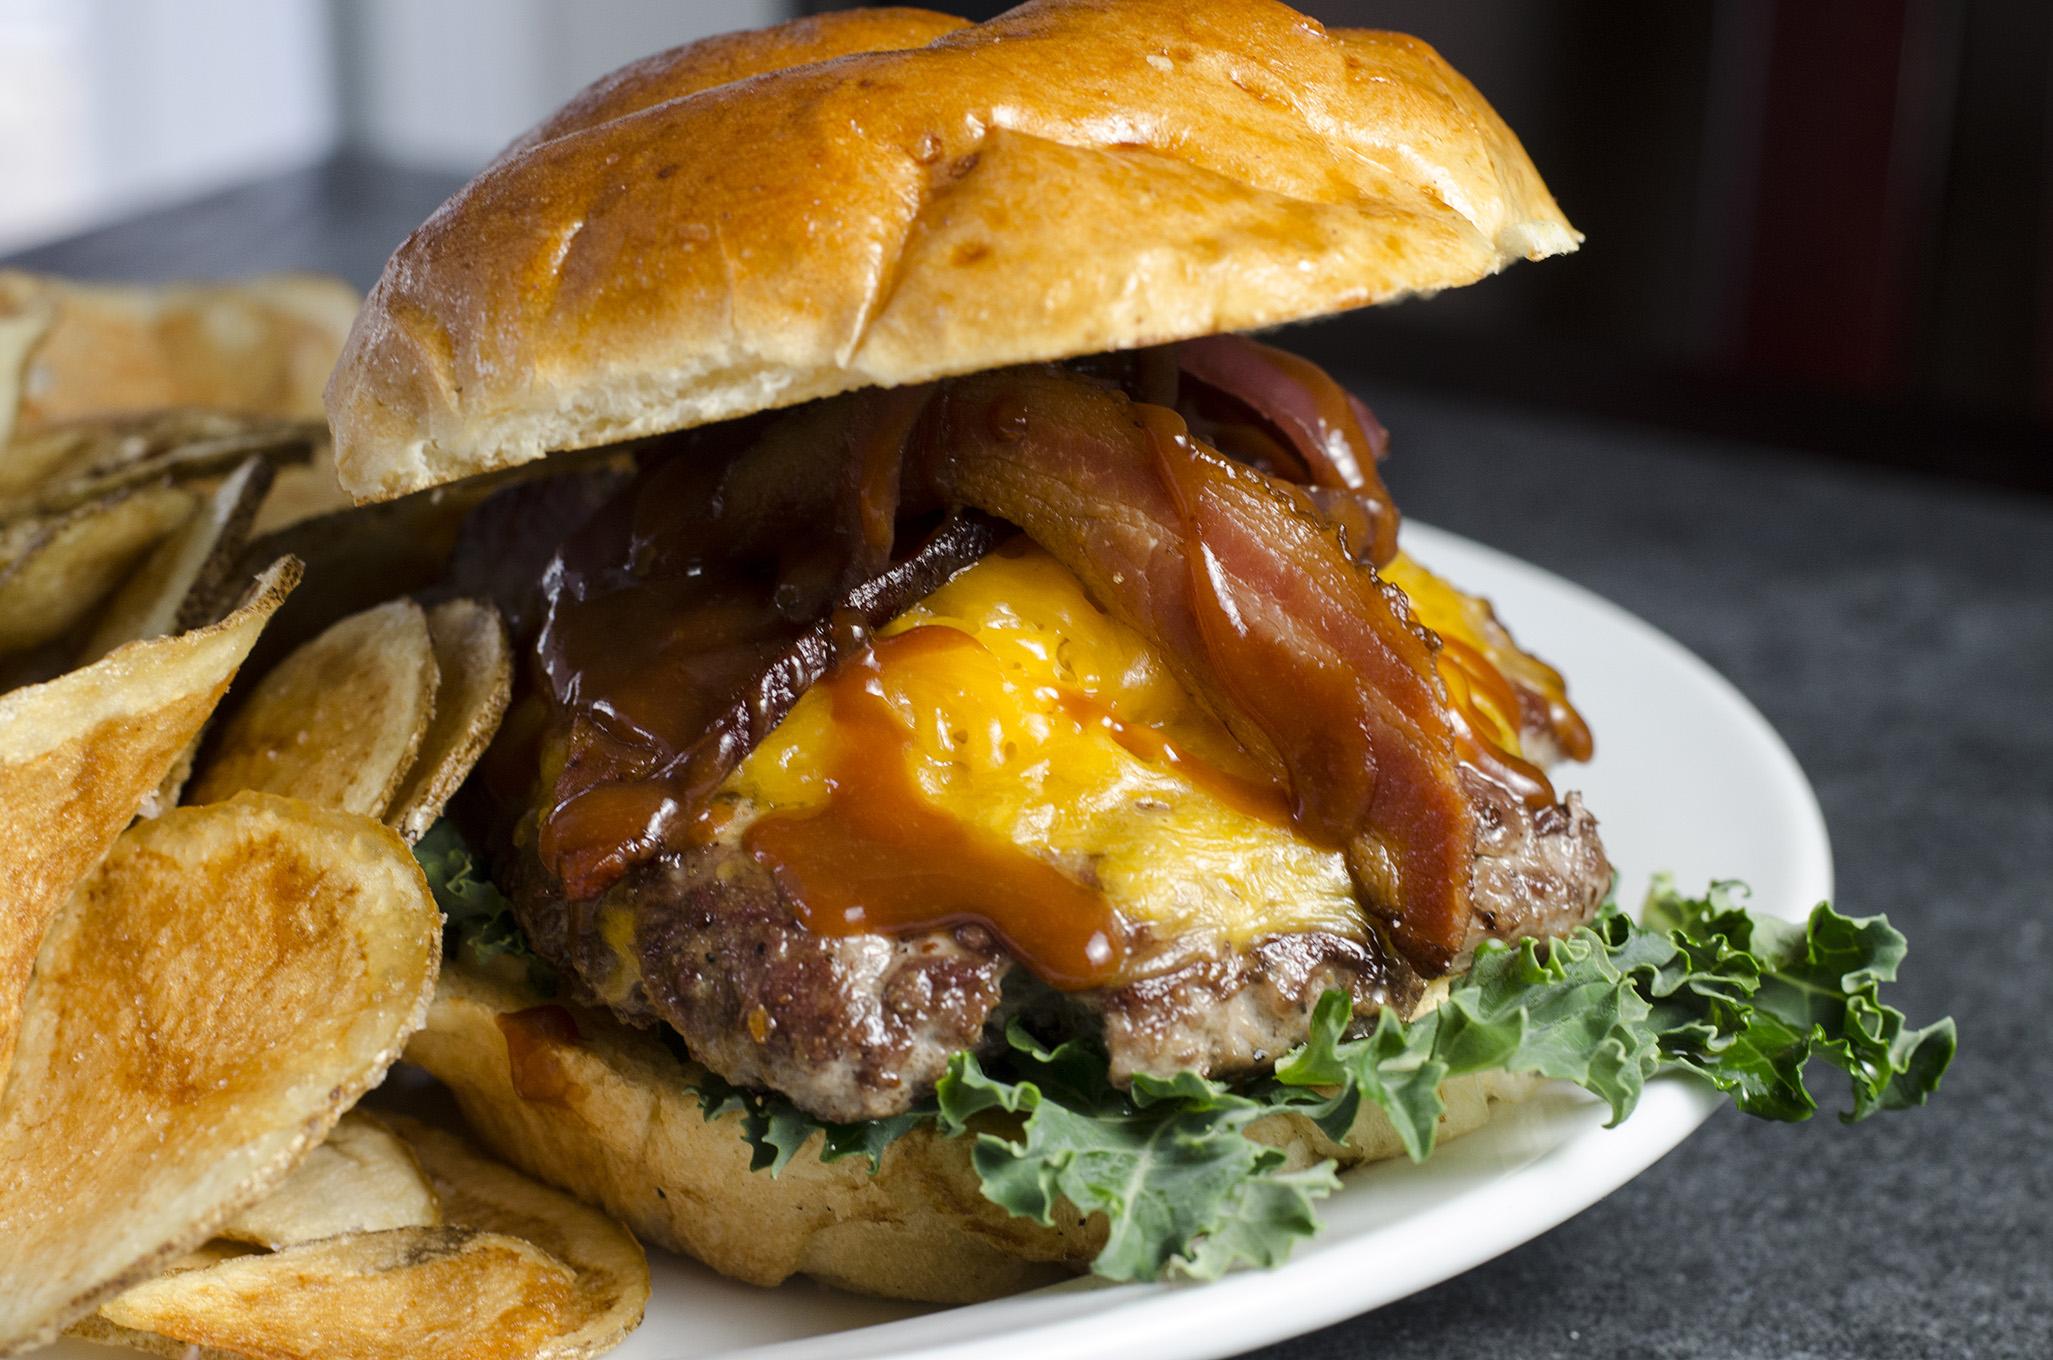 The Beacon Burger from Beacon Ale House in Amherstburg, Ontario.